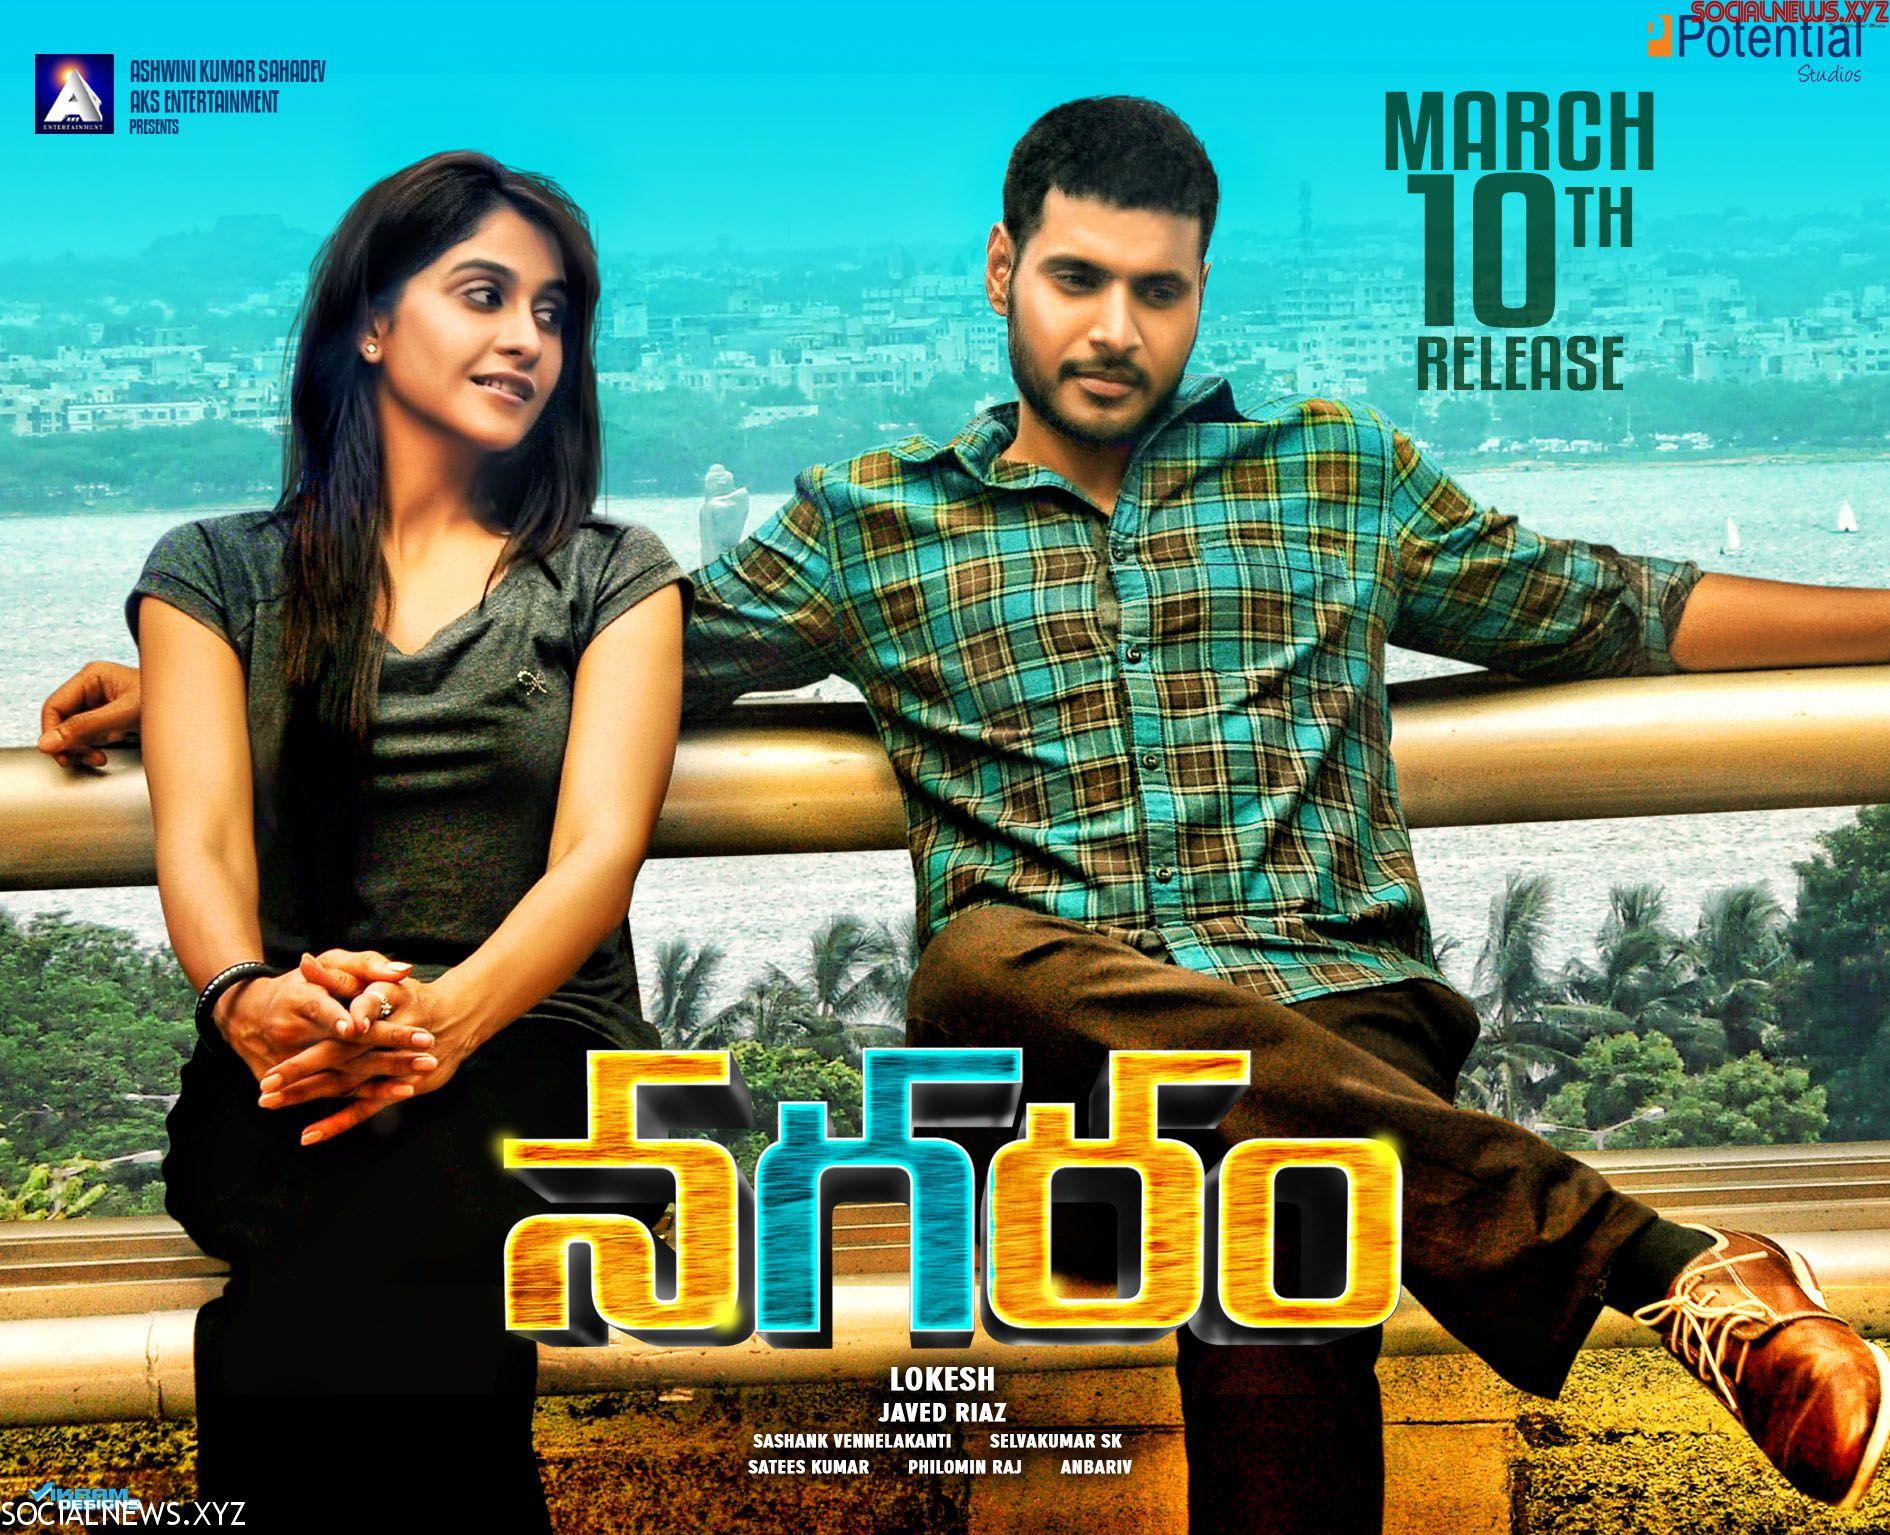 Nagaram Movie Stills And Posters - Social News XYZ